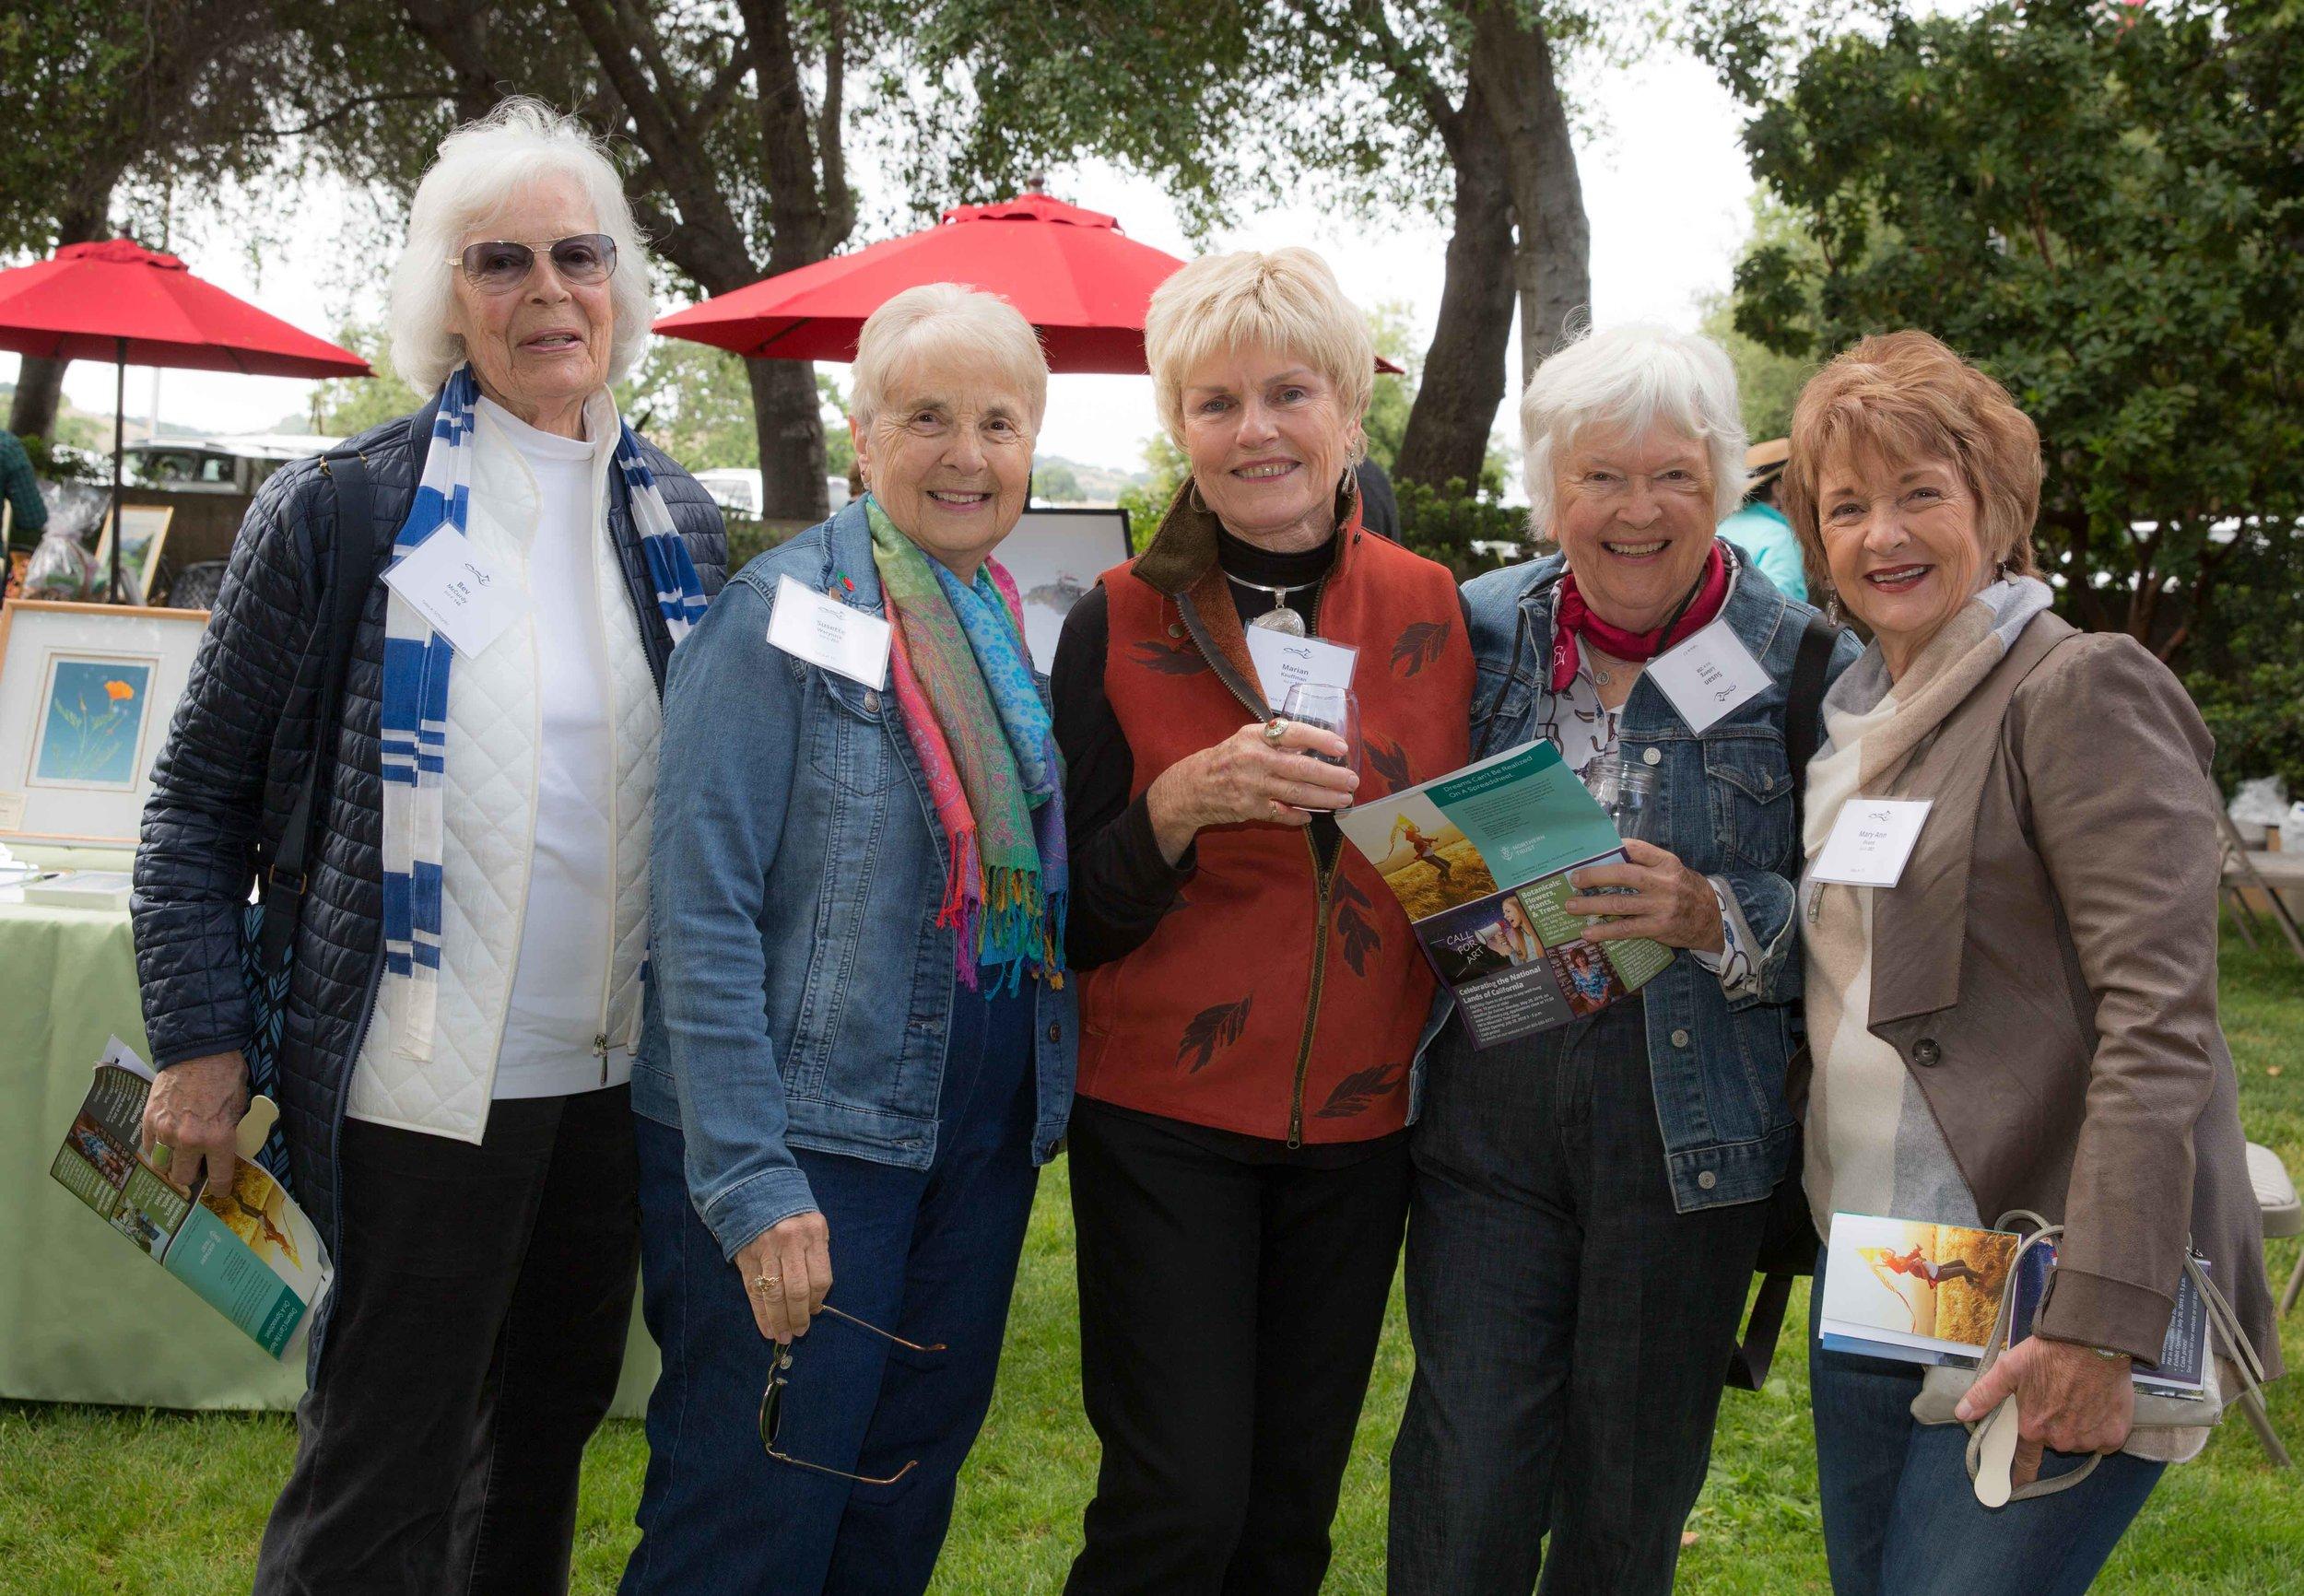 Bev McCurdy, Susette Warynick, Marian Kauffman, Susan Loberg, Mary Ann Evans